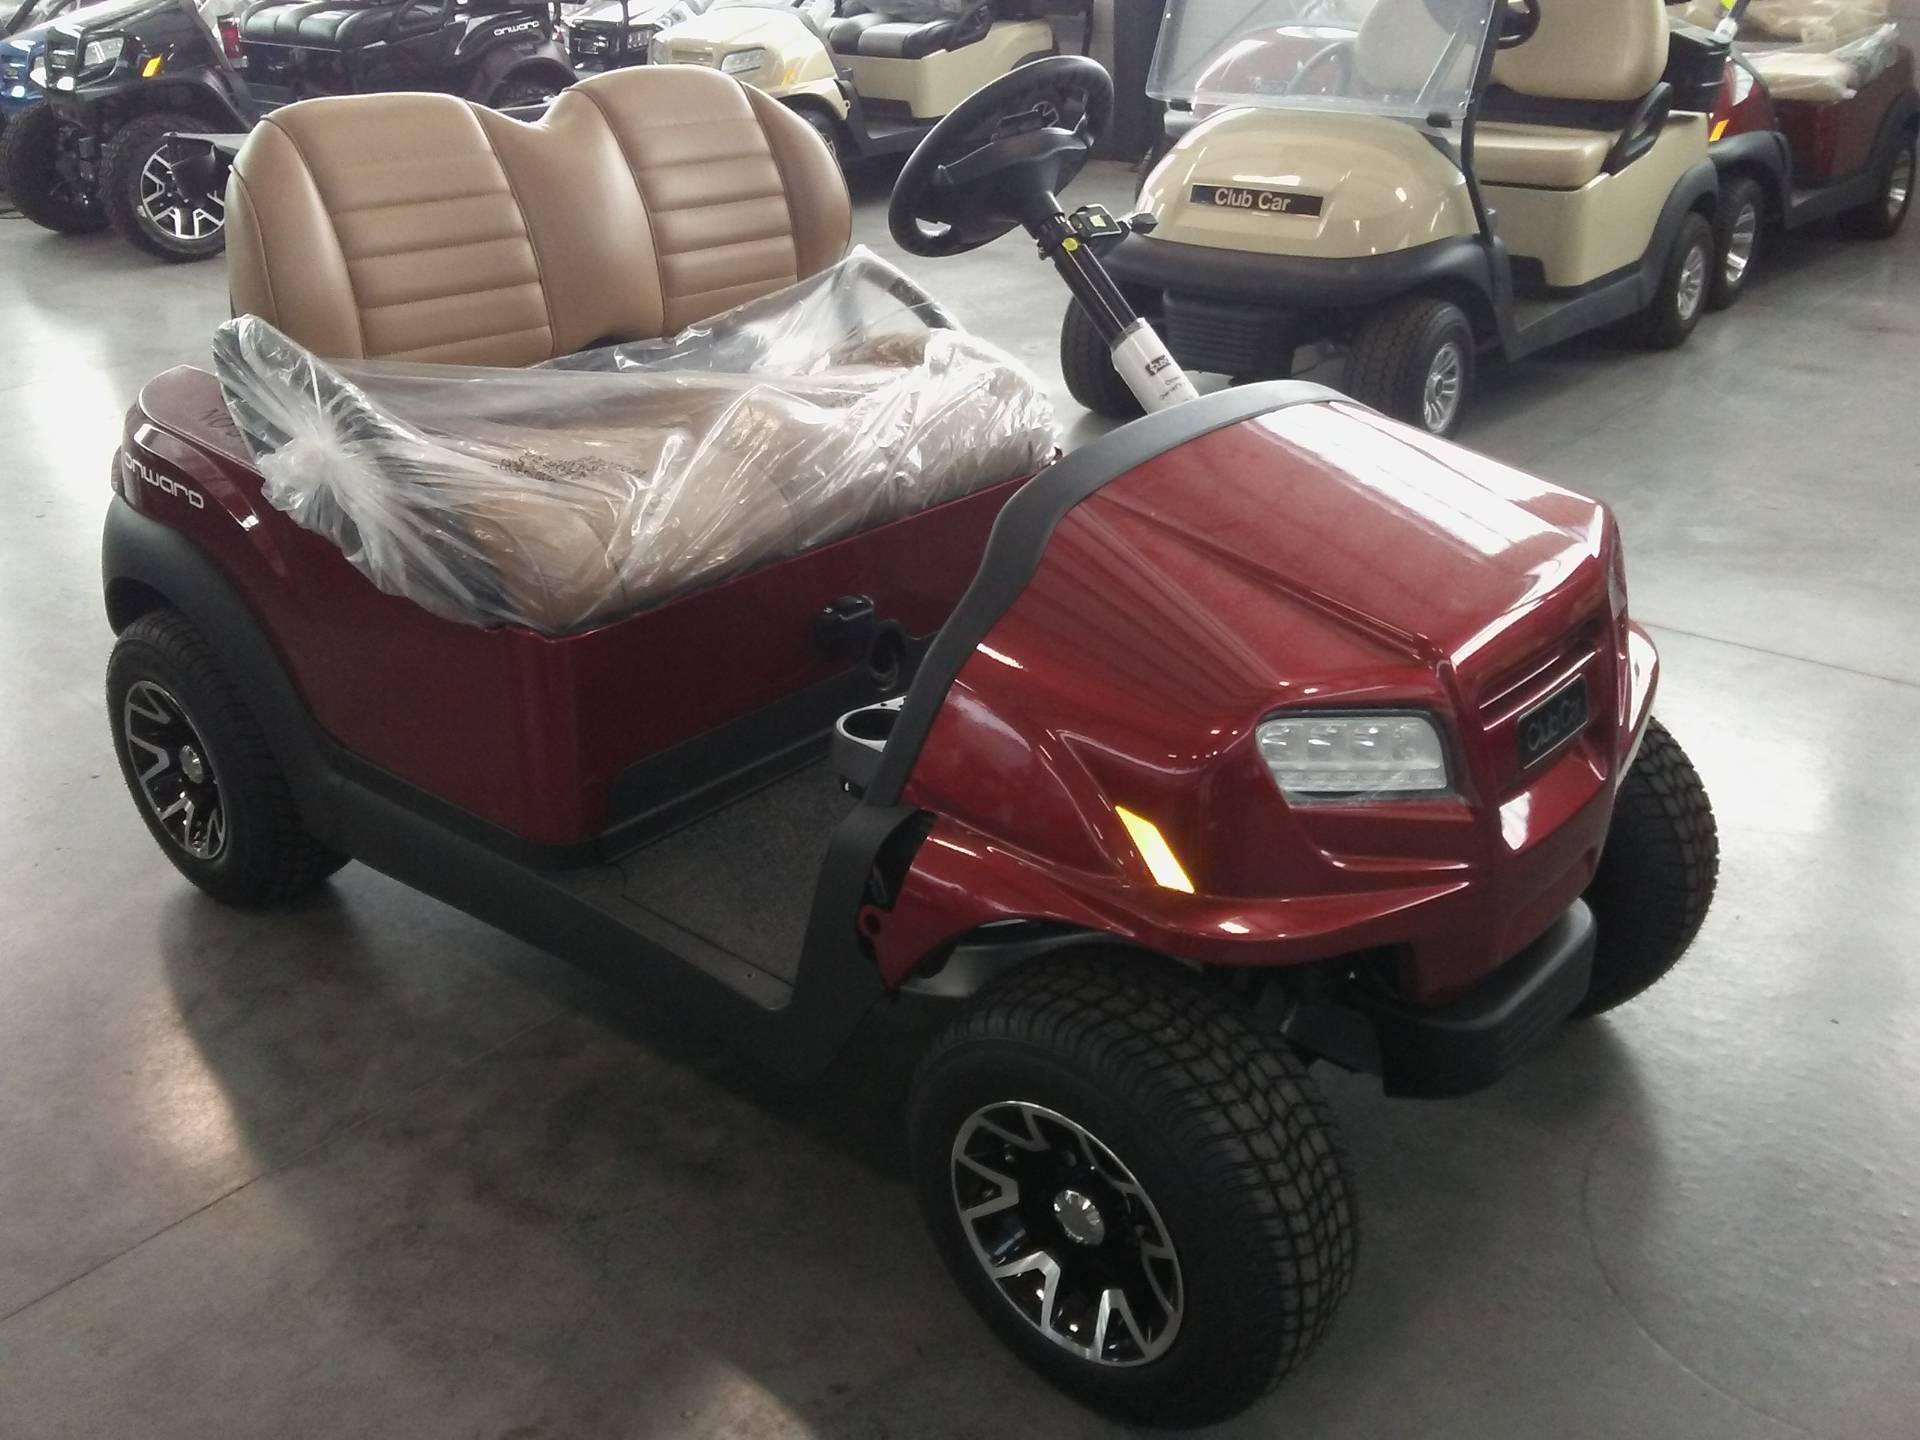 New 2019 Club Car Onward 2 Passenger Electric Golf Carts in